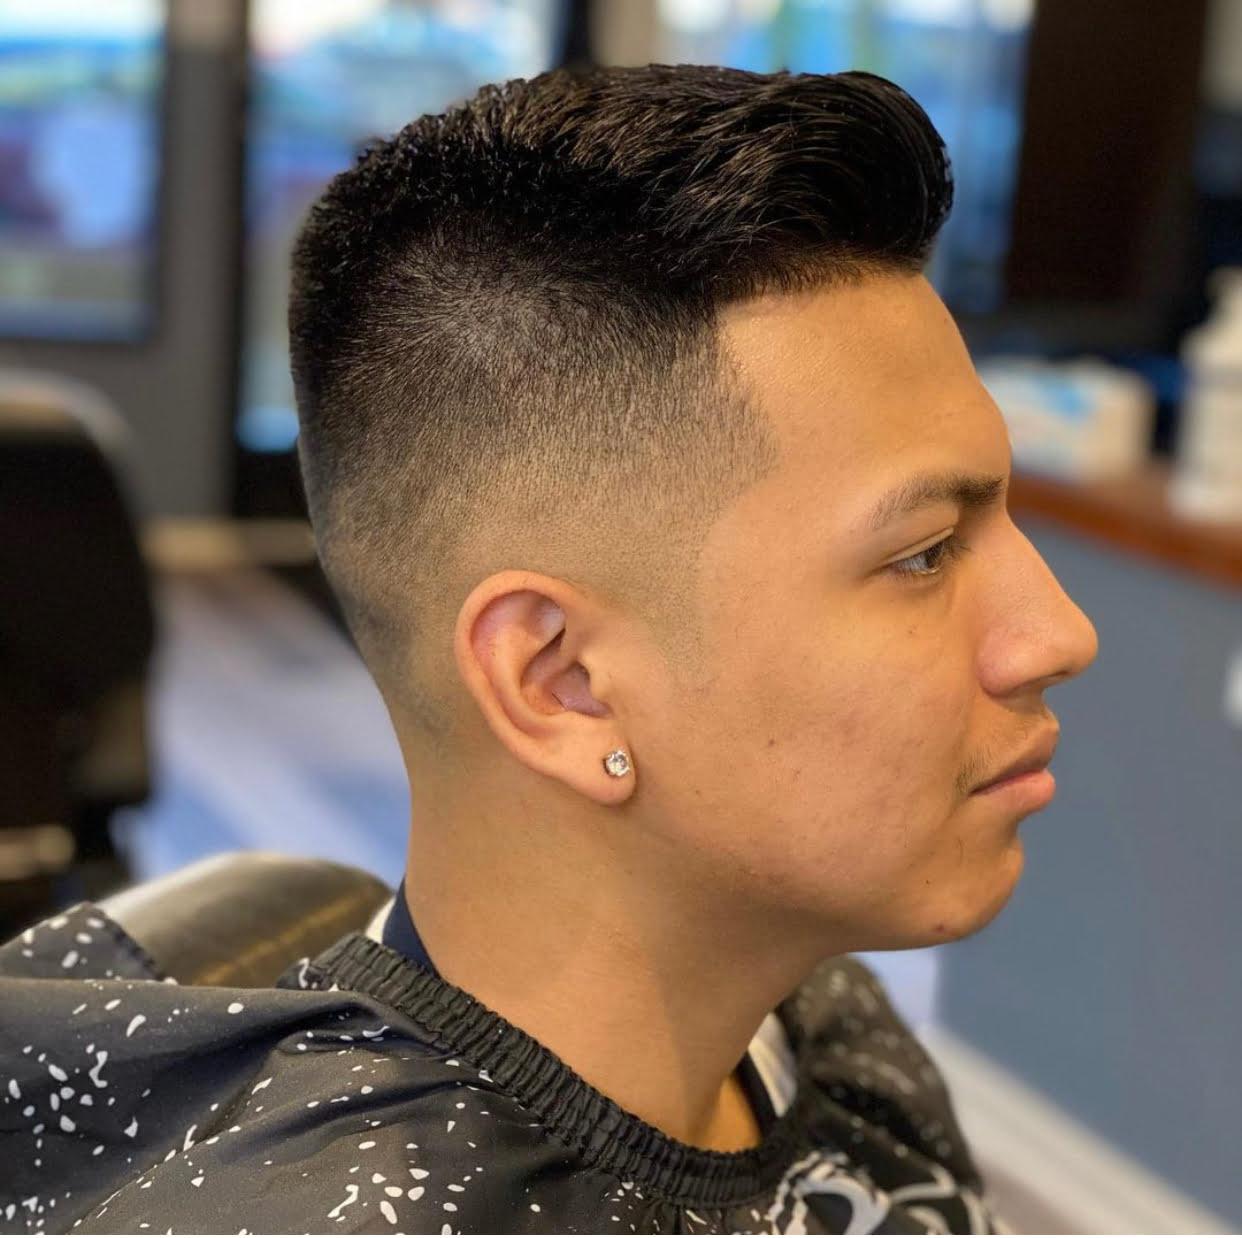 Barber_Gio2